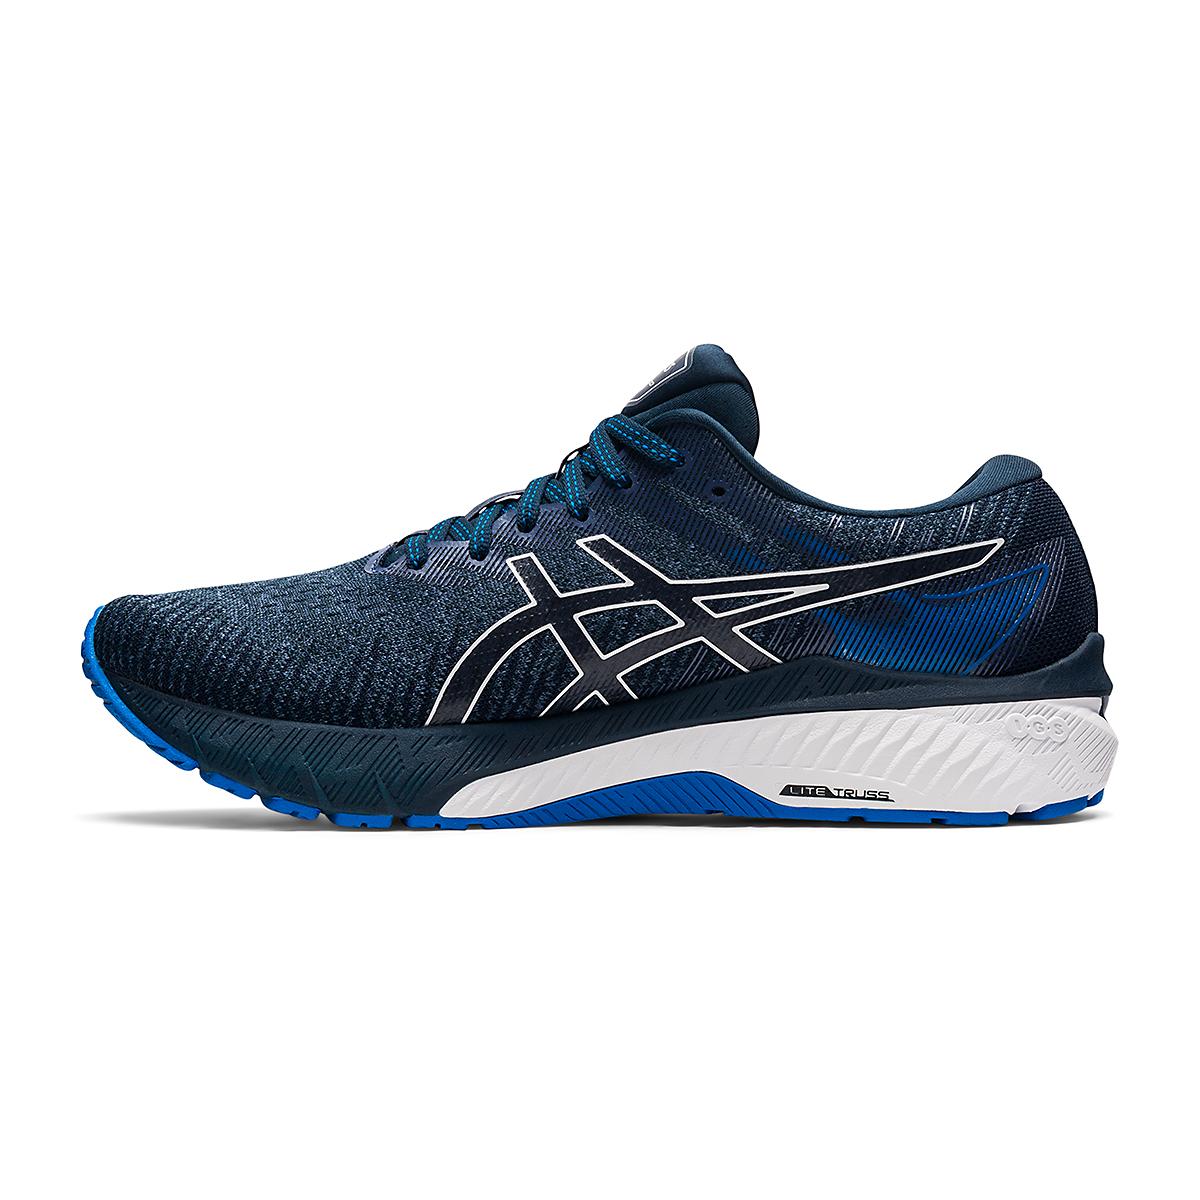 Men's Asics GT-2000 10 Running Shoe - Color: Thunder Blue/French Blue - Size: 7 - Width: Regular, Thunder Blue/French Blue, large, image 2